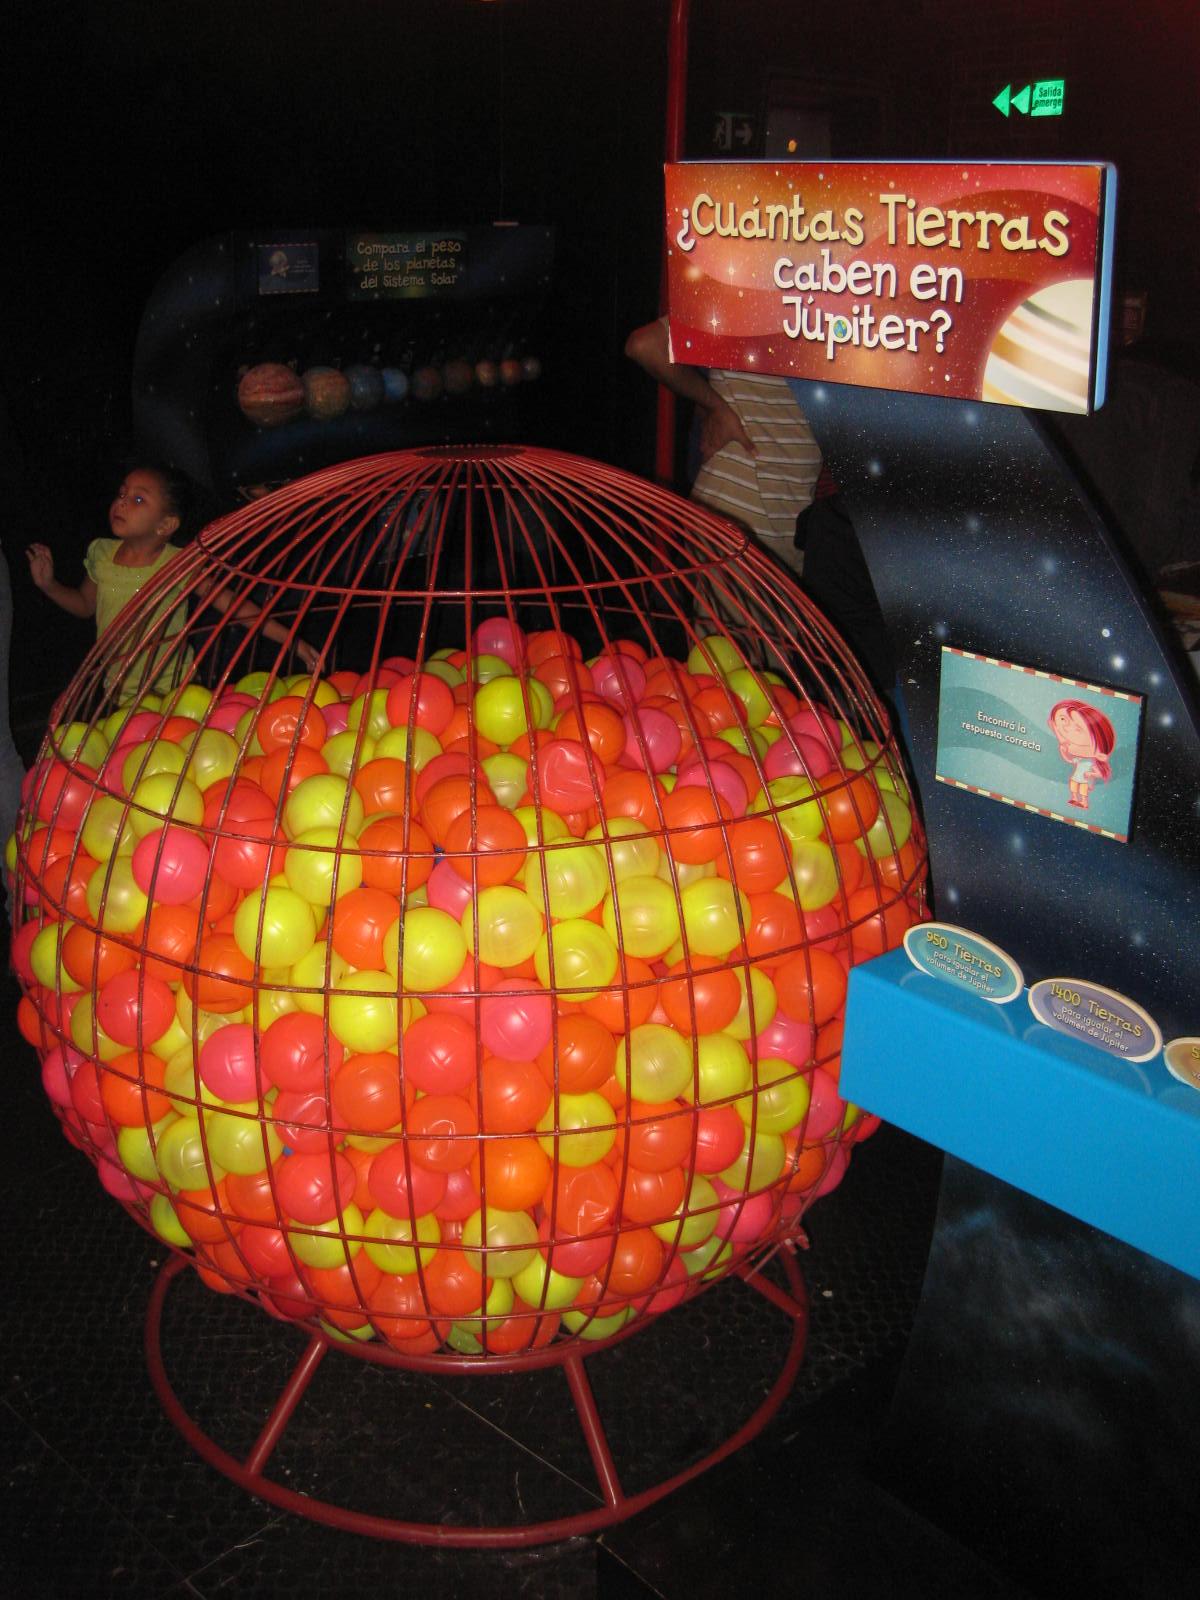 How many earths will fit inside jupiter